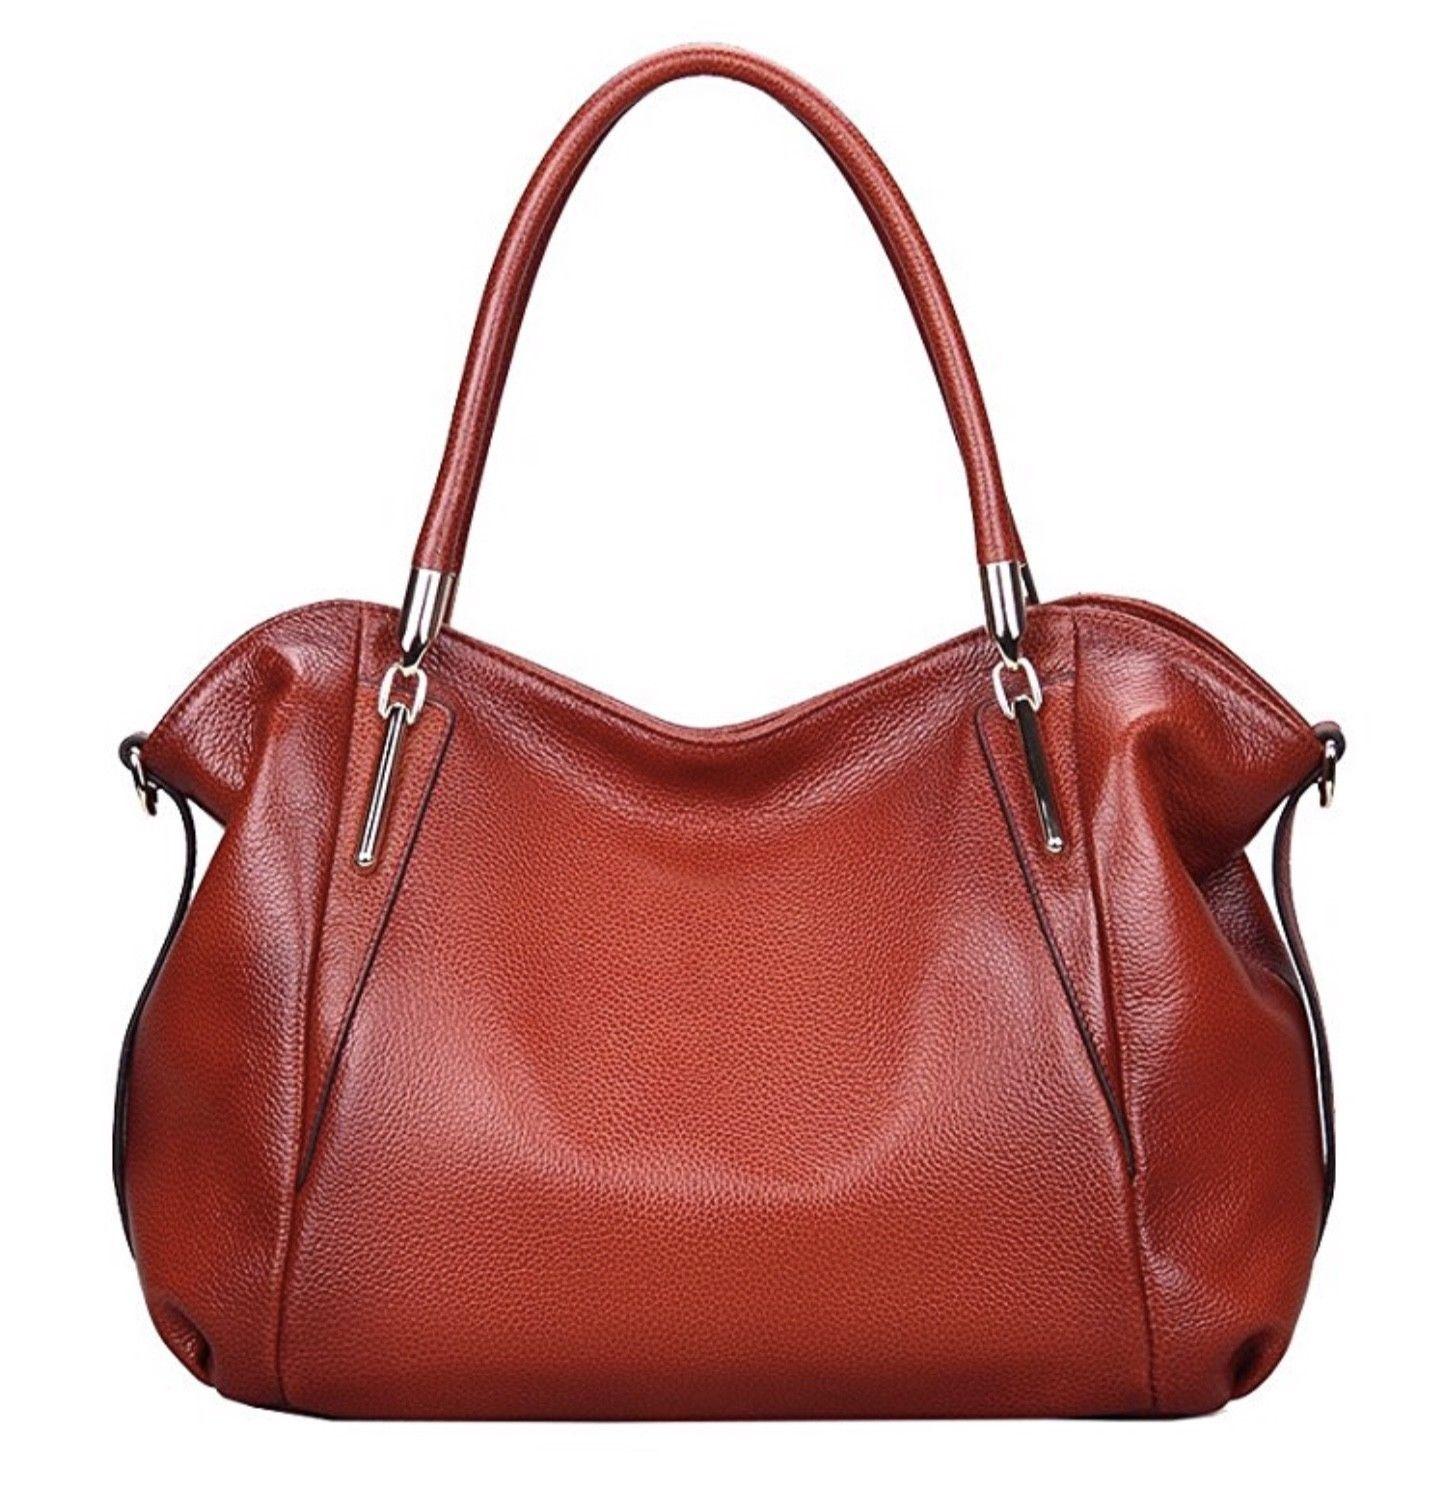 New Jair Pebbled Italian Leather Red Satchel Handbag Shoulder Bag